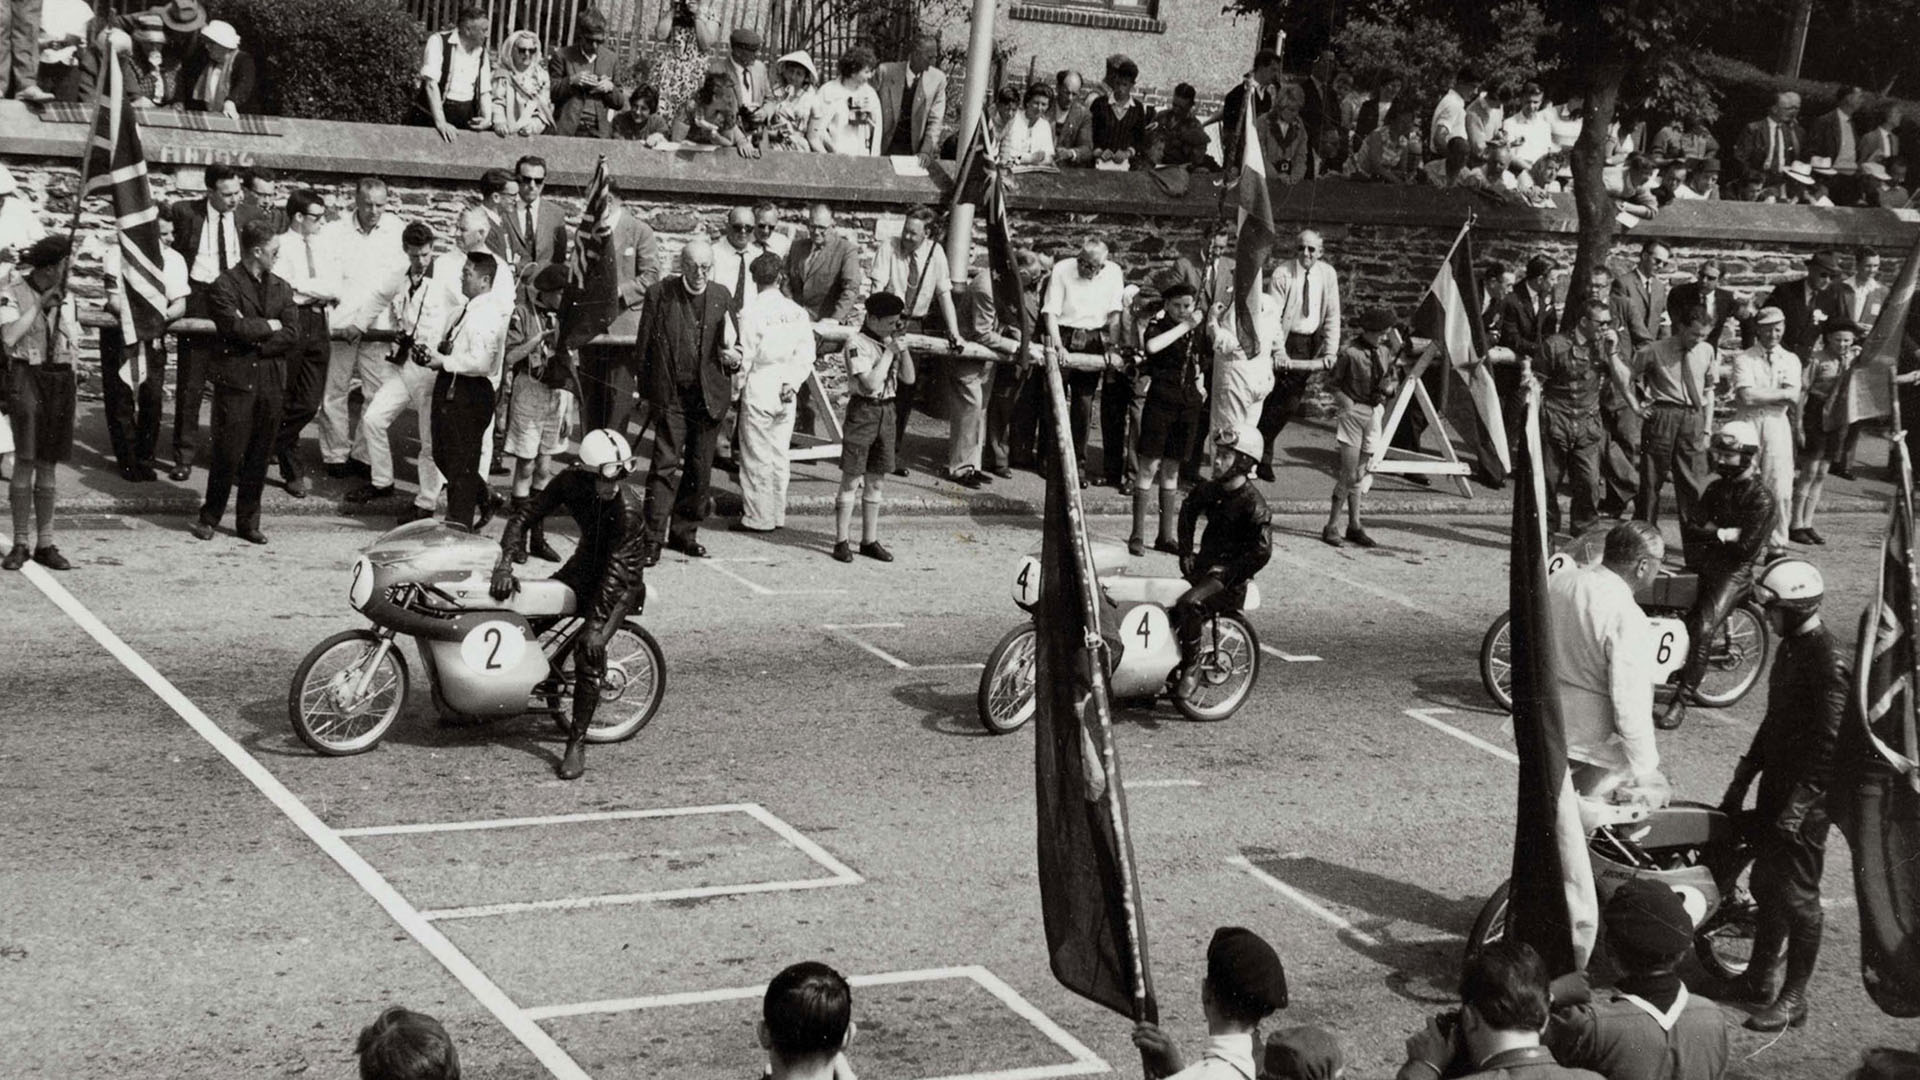 1962 Salida  de Ernst Degner para vencer en el TT de la Isla de Man